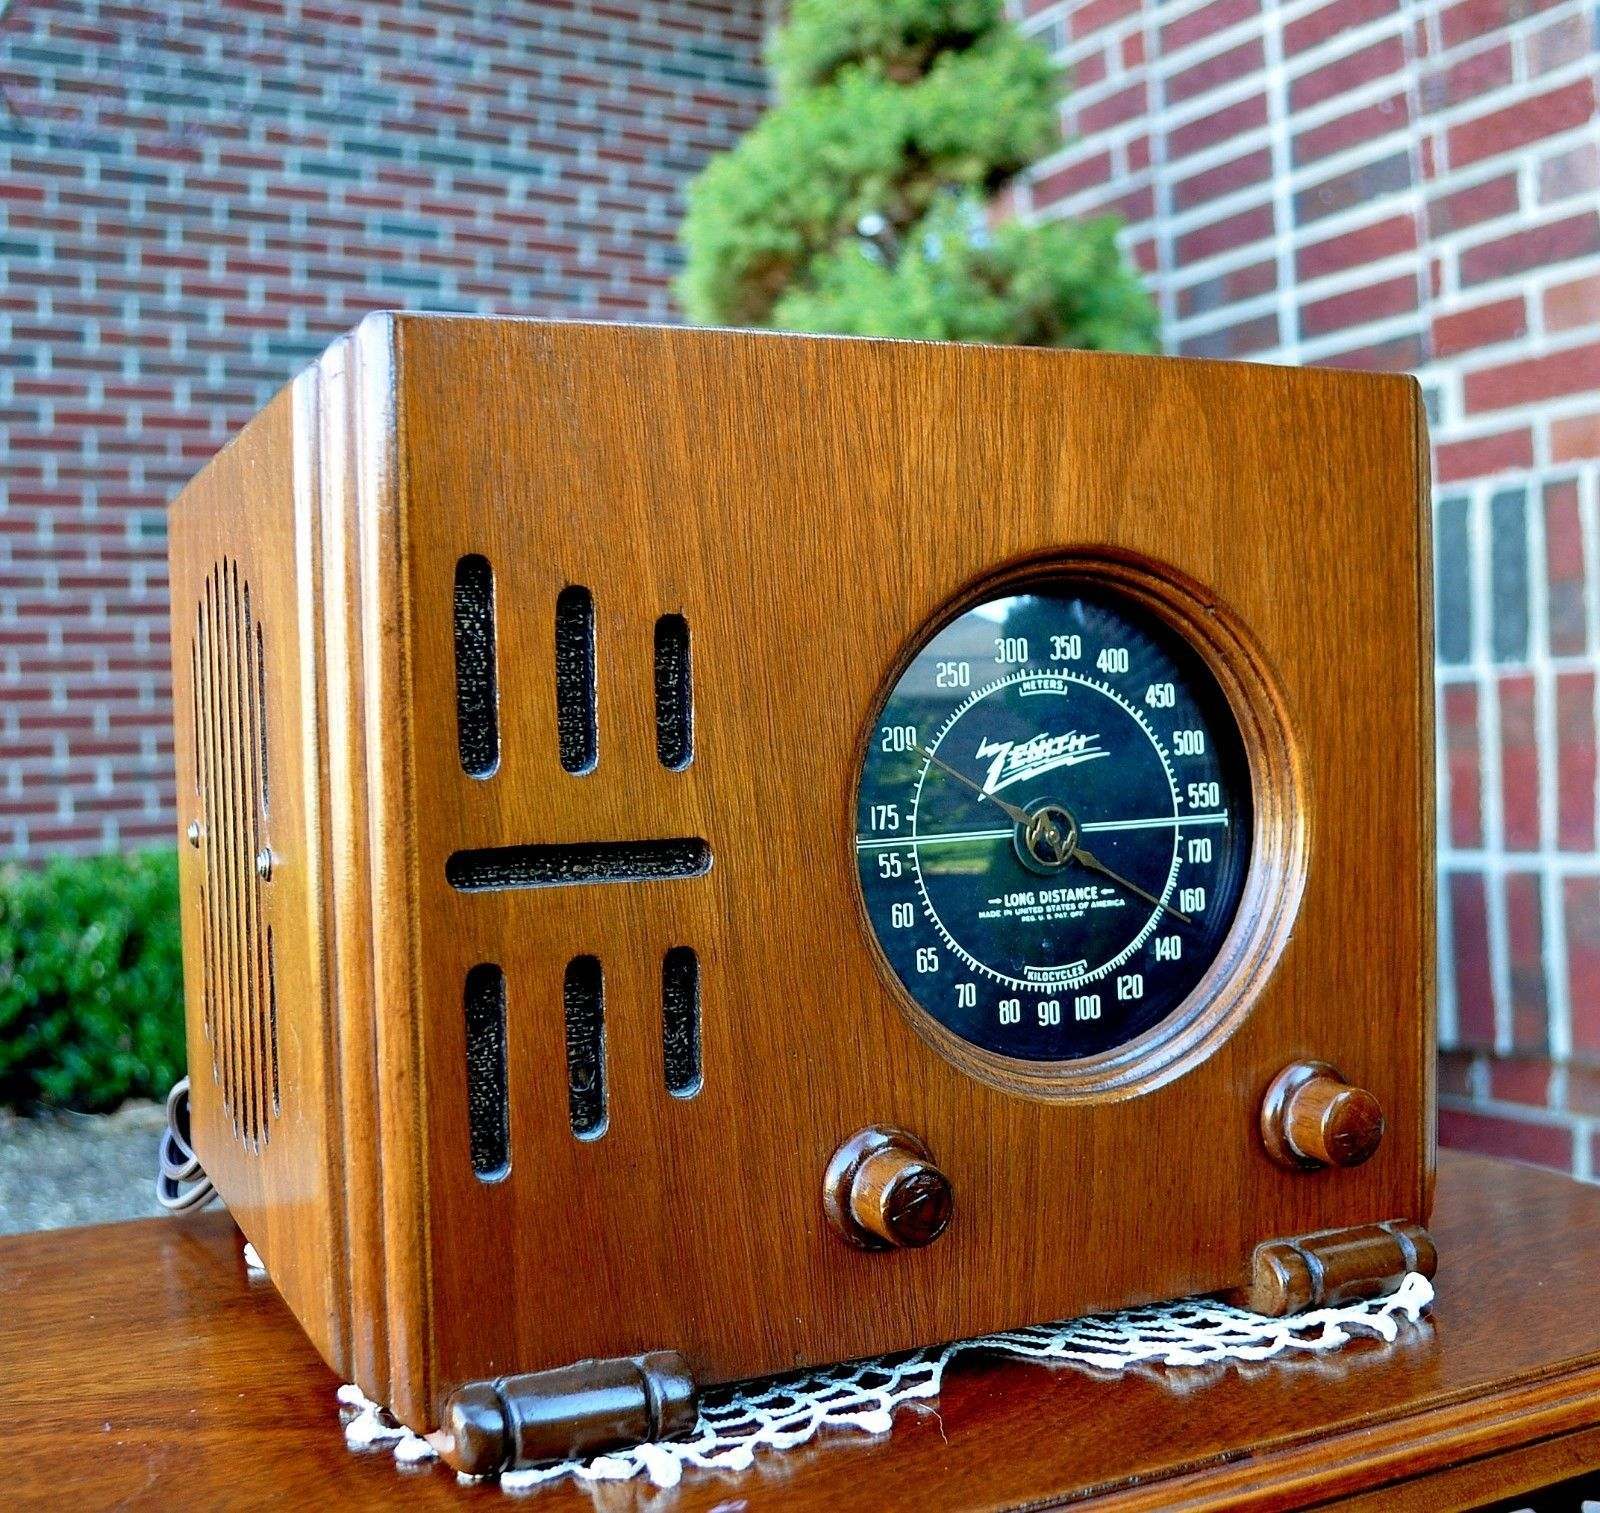 Serviced Antique Vintage Zenith Cube 5r216 Wood Deco Tube Radio Works Perfect Radio Antigo Radios Coisa Antiga